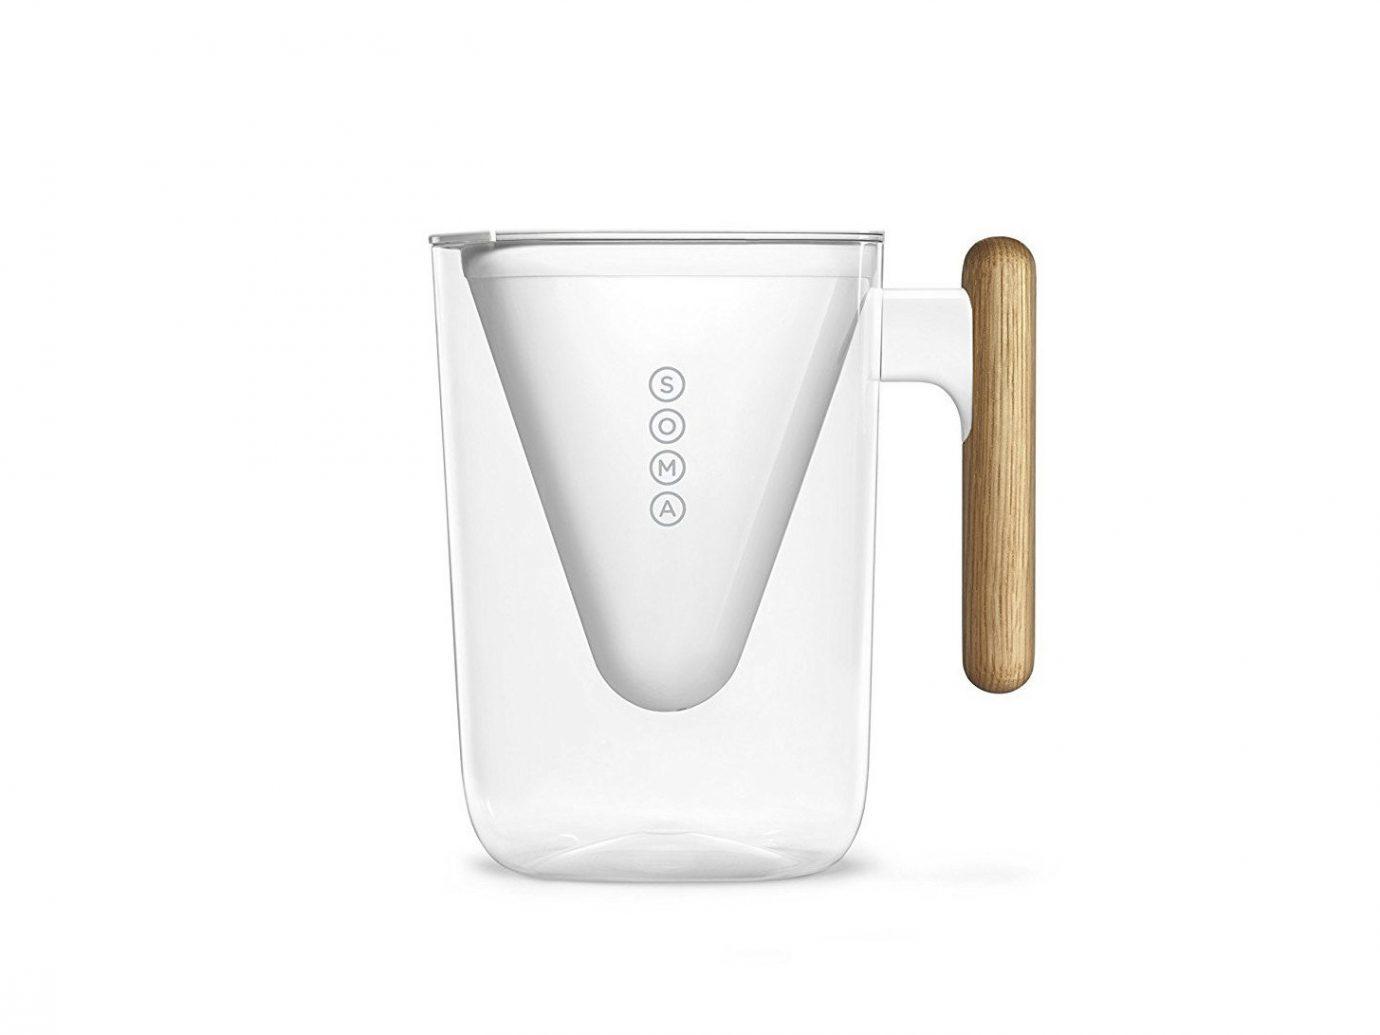 Travel Shop indoor glass product product design mug highball glass tableware pint glass drinkware cup tumbler